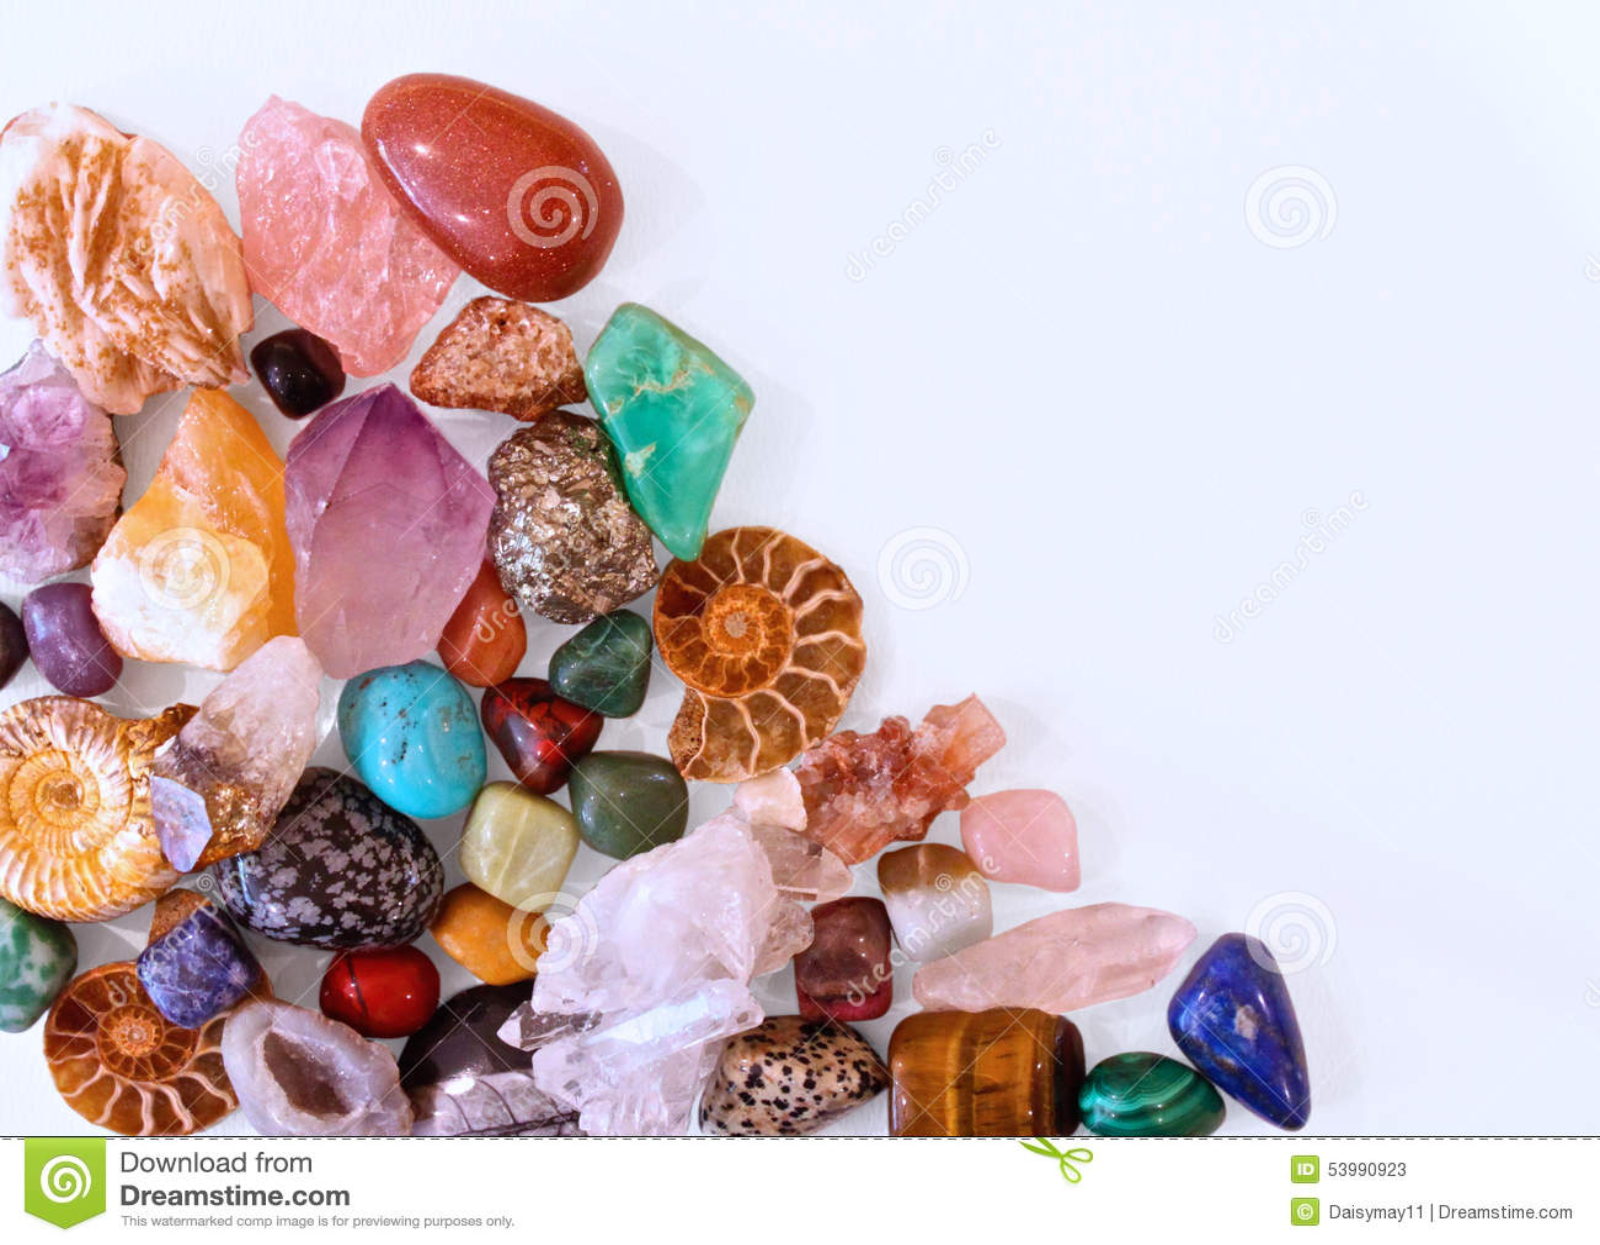 Minerals Crystals And Semi Precious Stones Stock Image